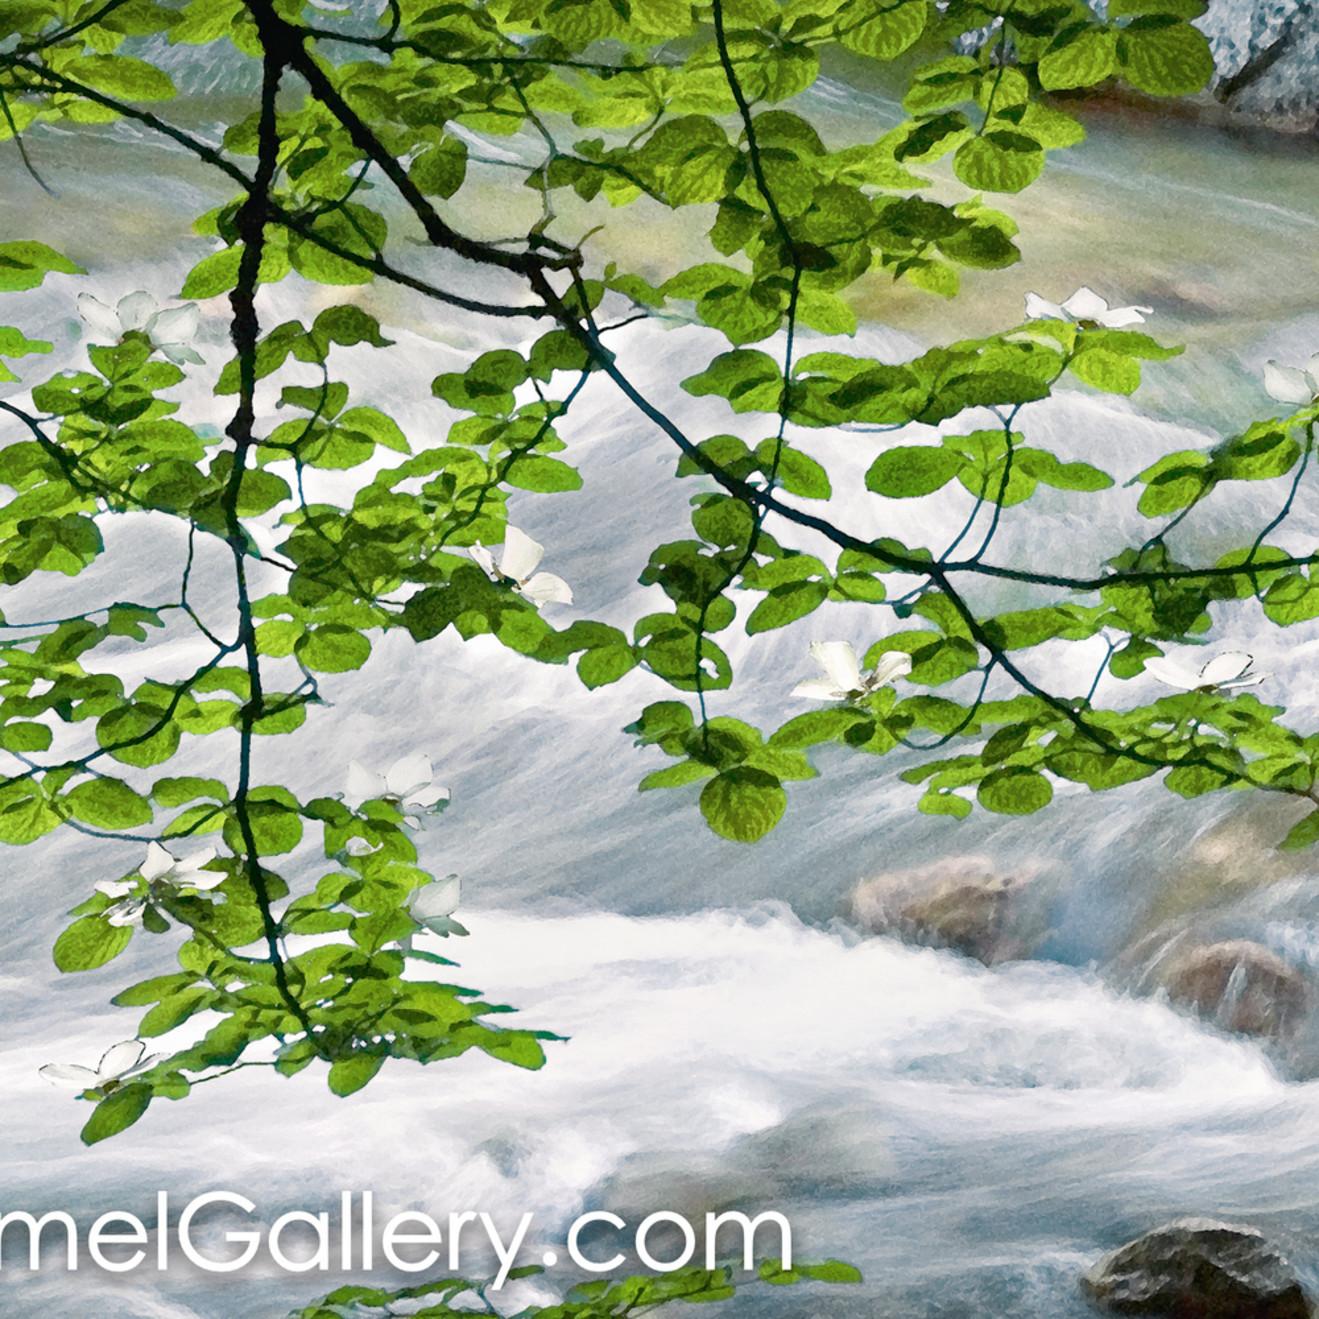 Along the river bank rcxvwq